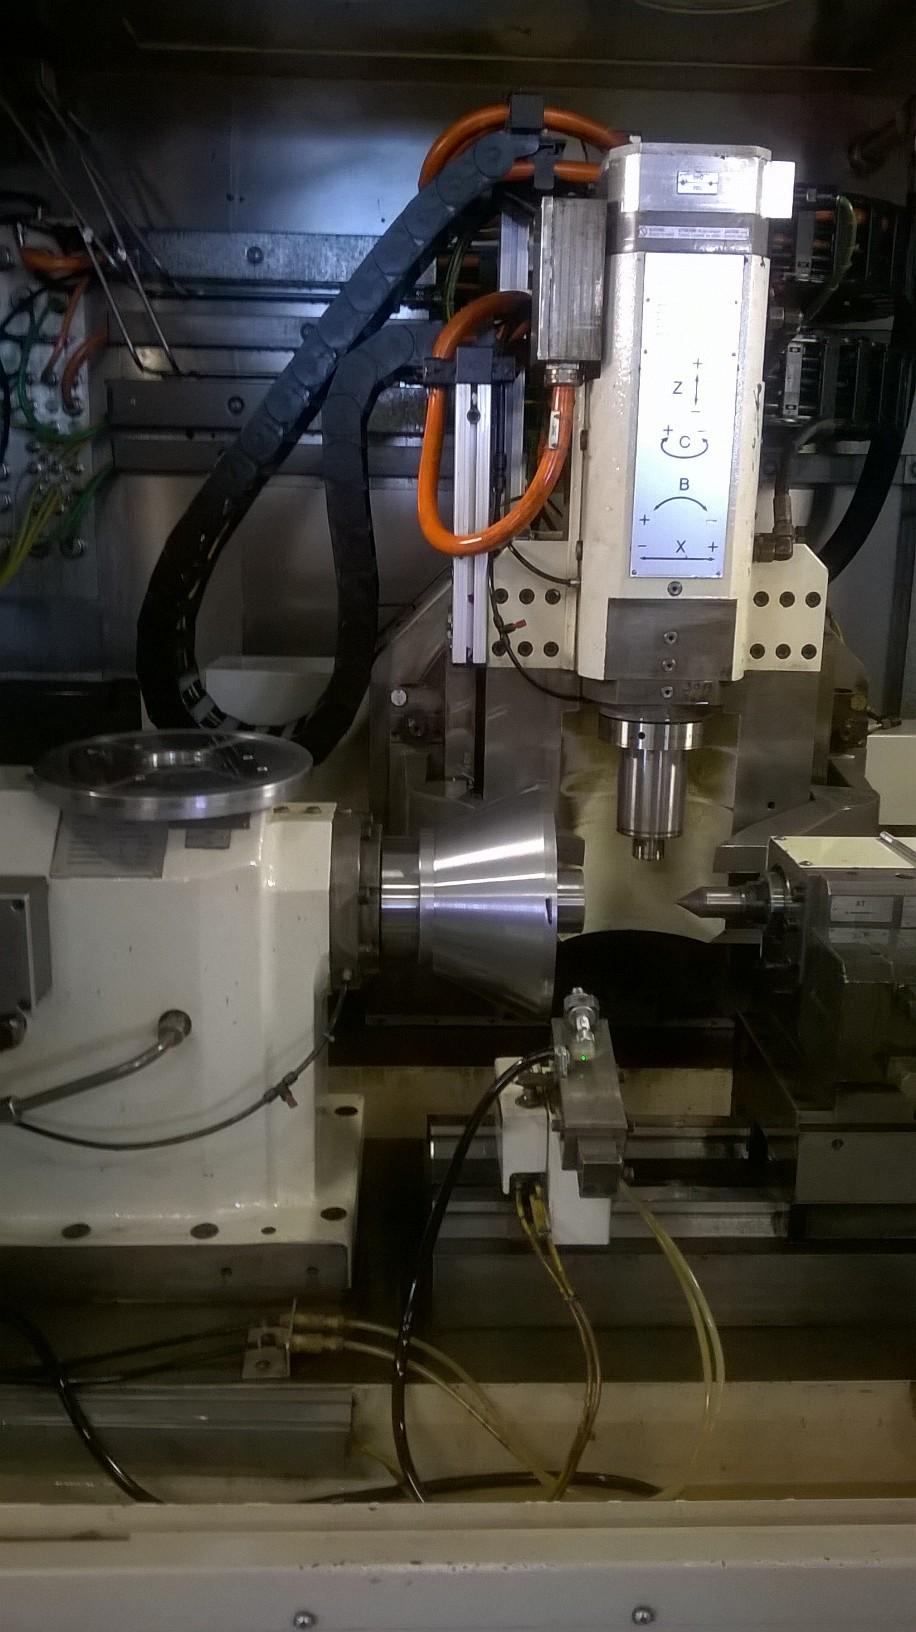 Kapp KX1 Gear grinding machine - Exapro